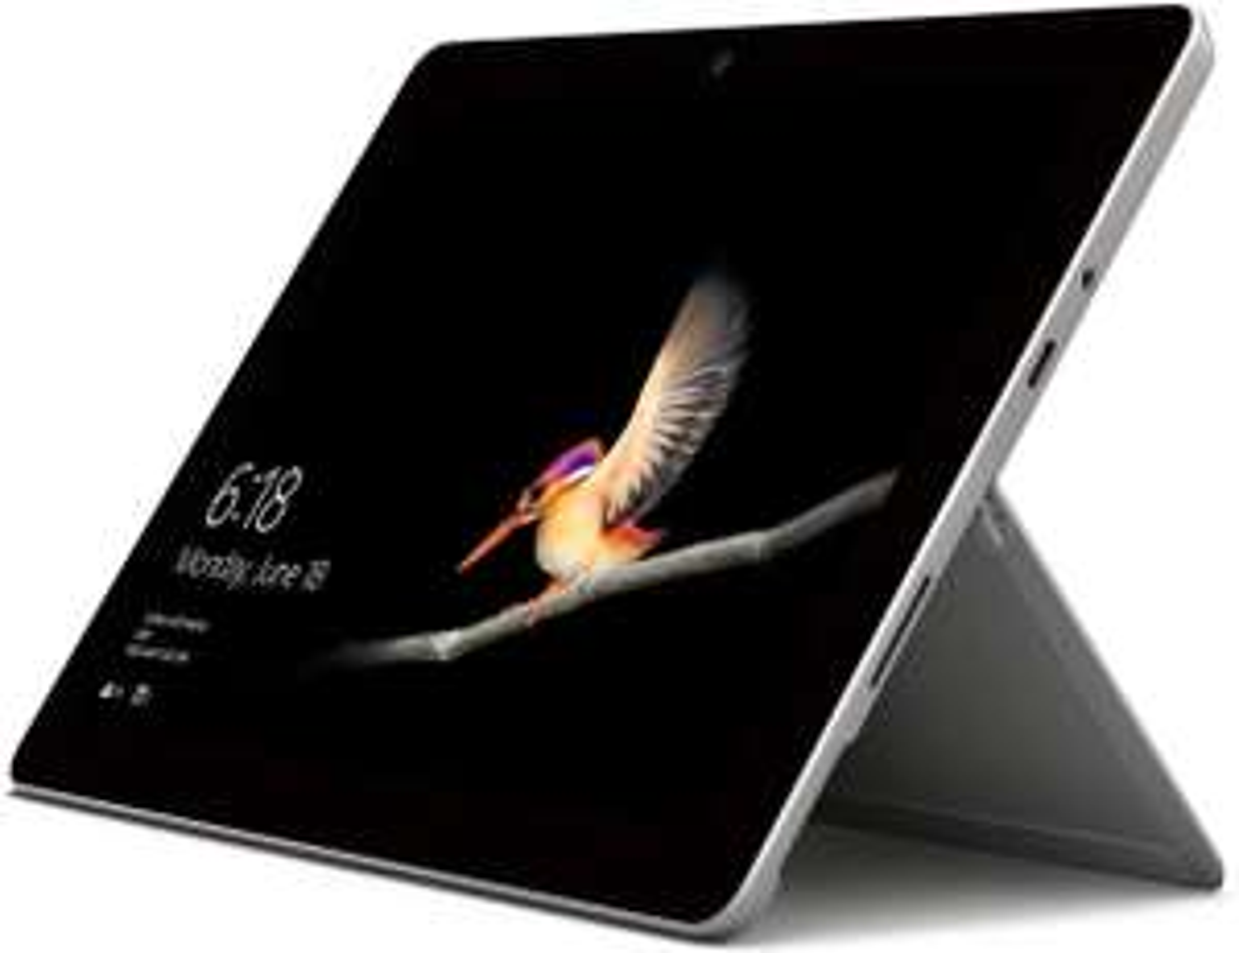 Microsoft Surface GO Intel Pentium Gold Processor 4415Y, 4Gb RAM, 64Gb eMMC SSD, 10 inch Touchscreen 2-in-1 Laptop £339 @ Very